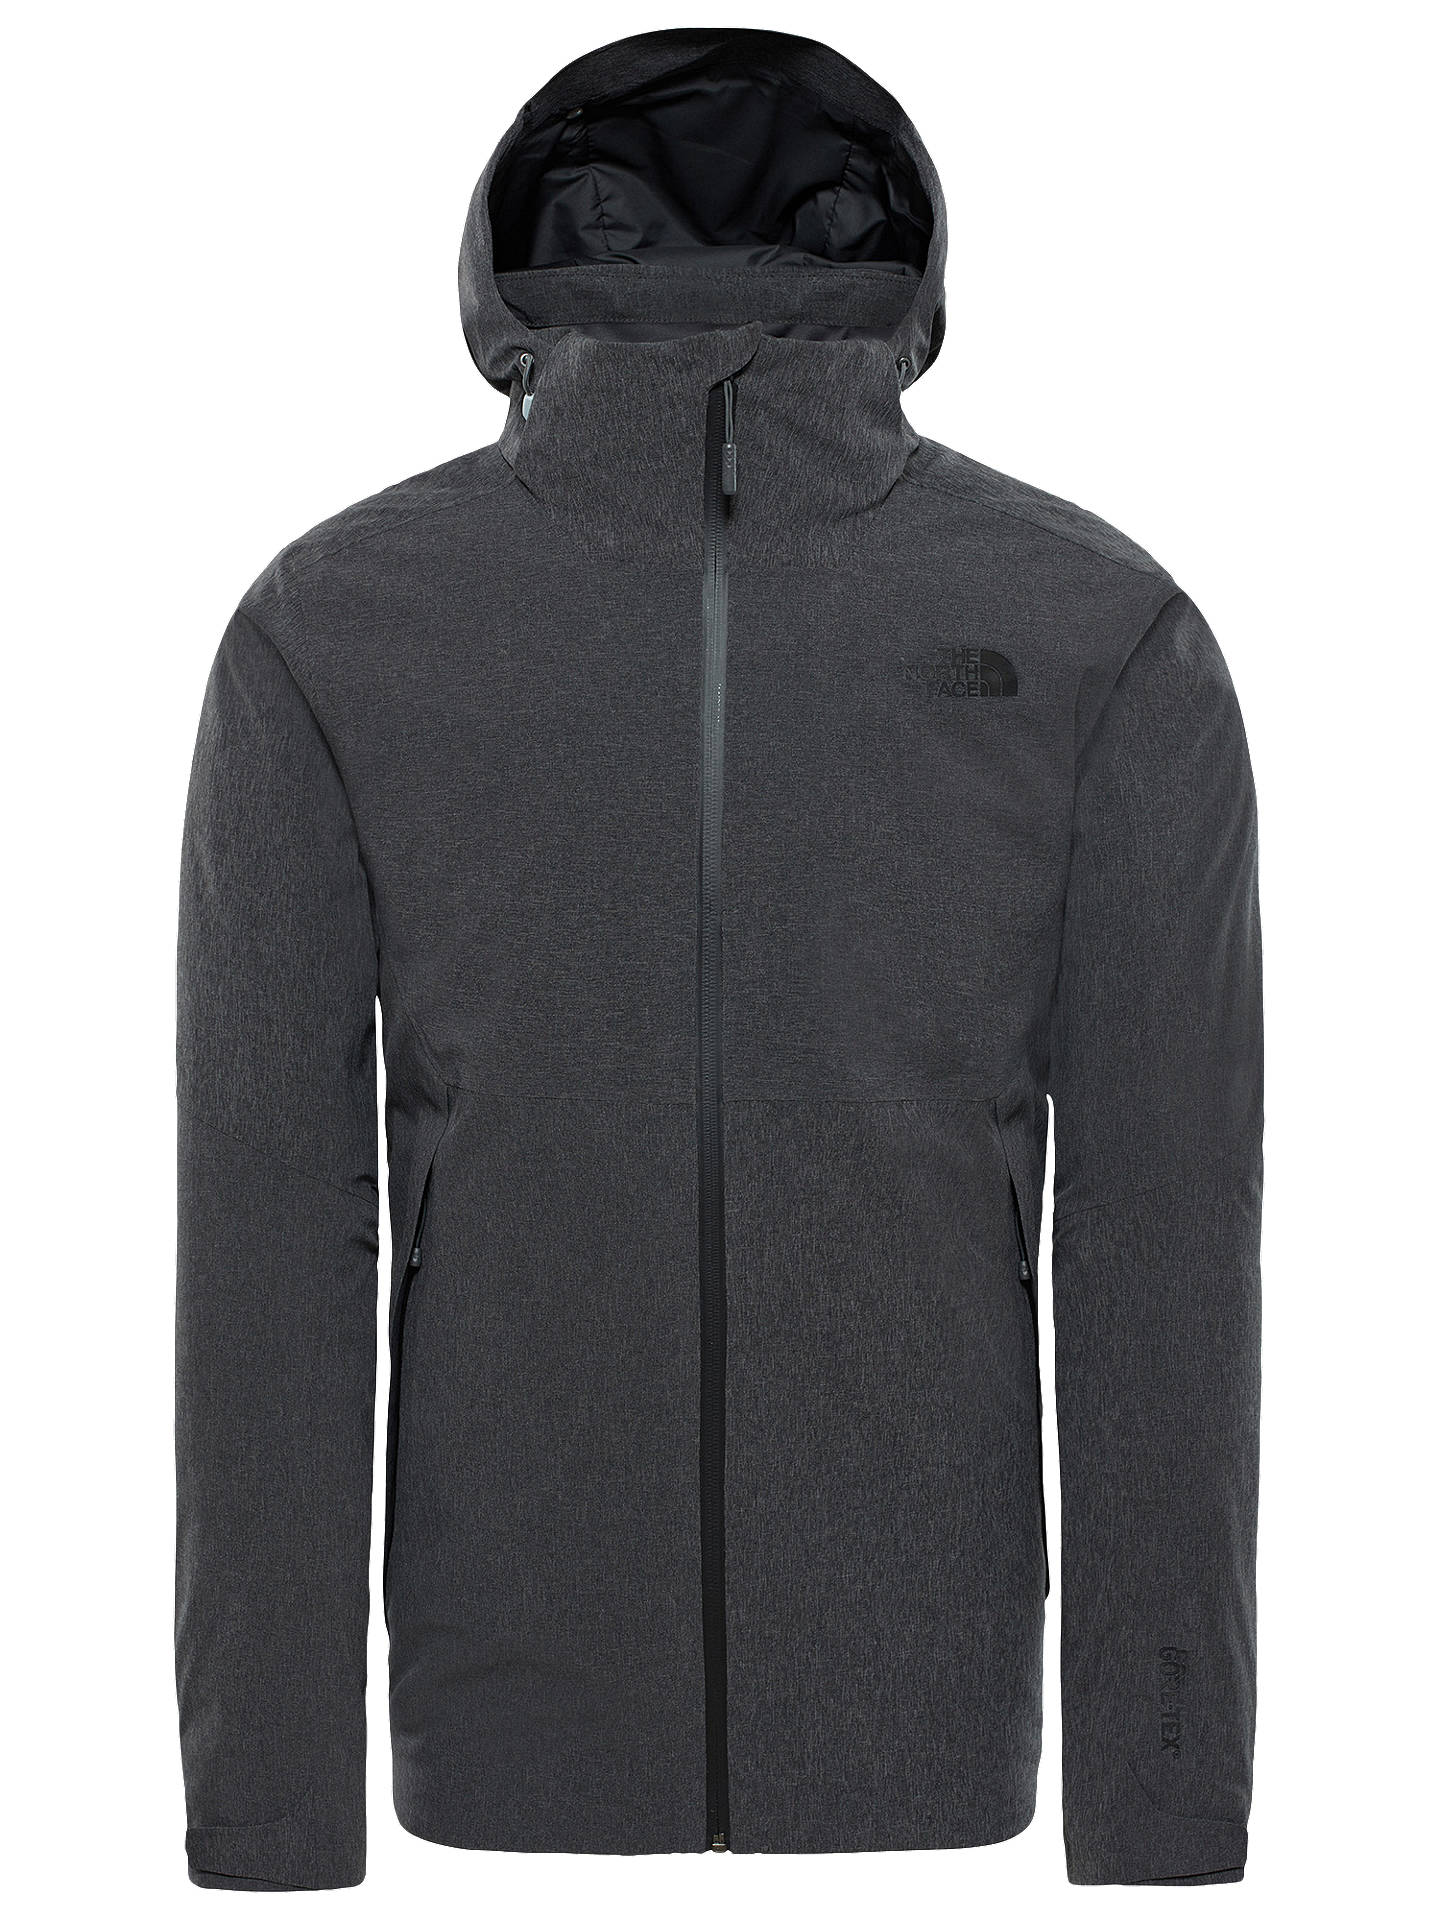 c24849b2a The North Face Insulated Apex Flex GTX Men's Waterproof Jacket, Dark ...